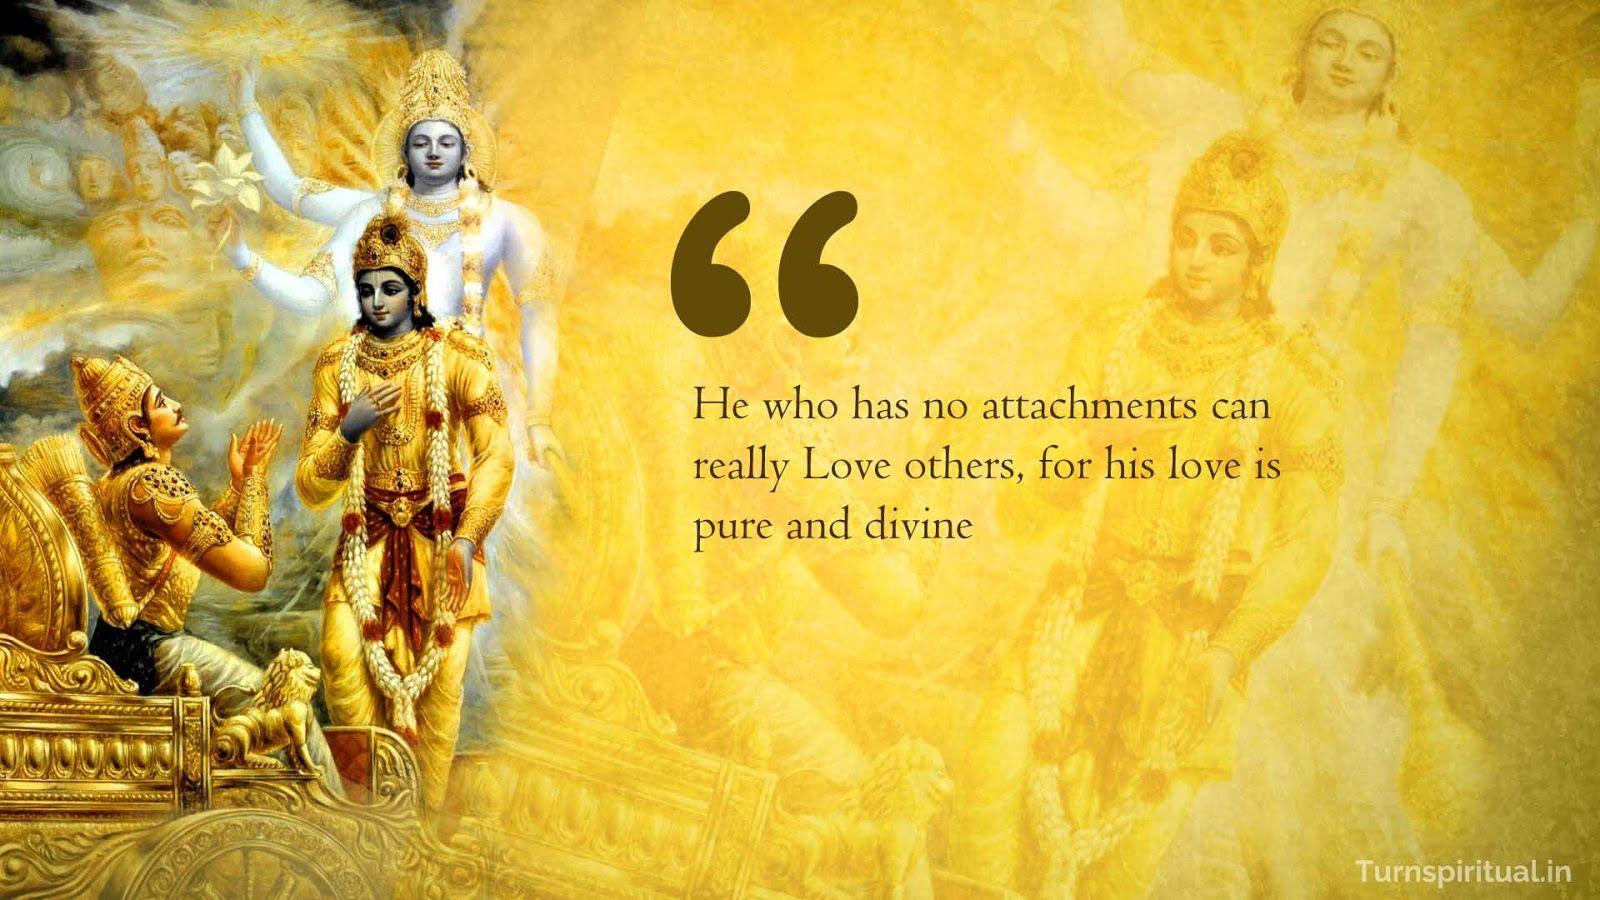 Bhagavad Gita Quotes On Love Pinterest thumbnail